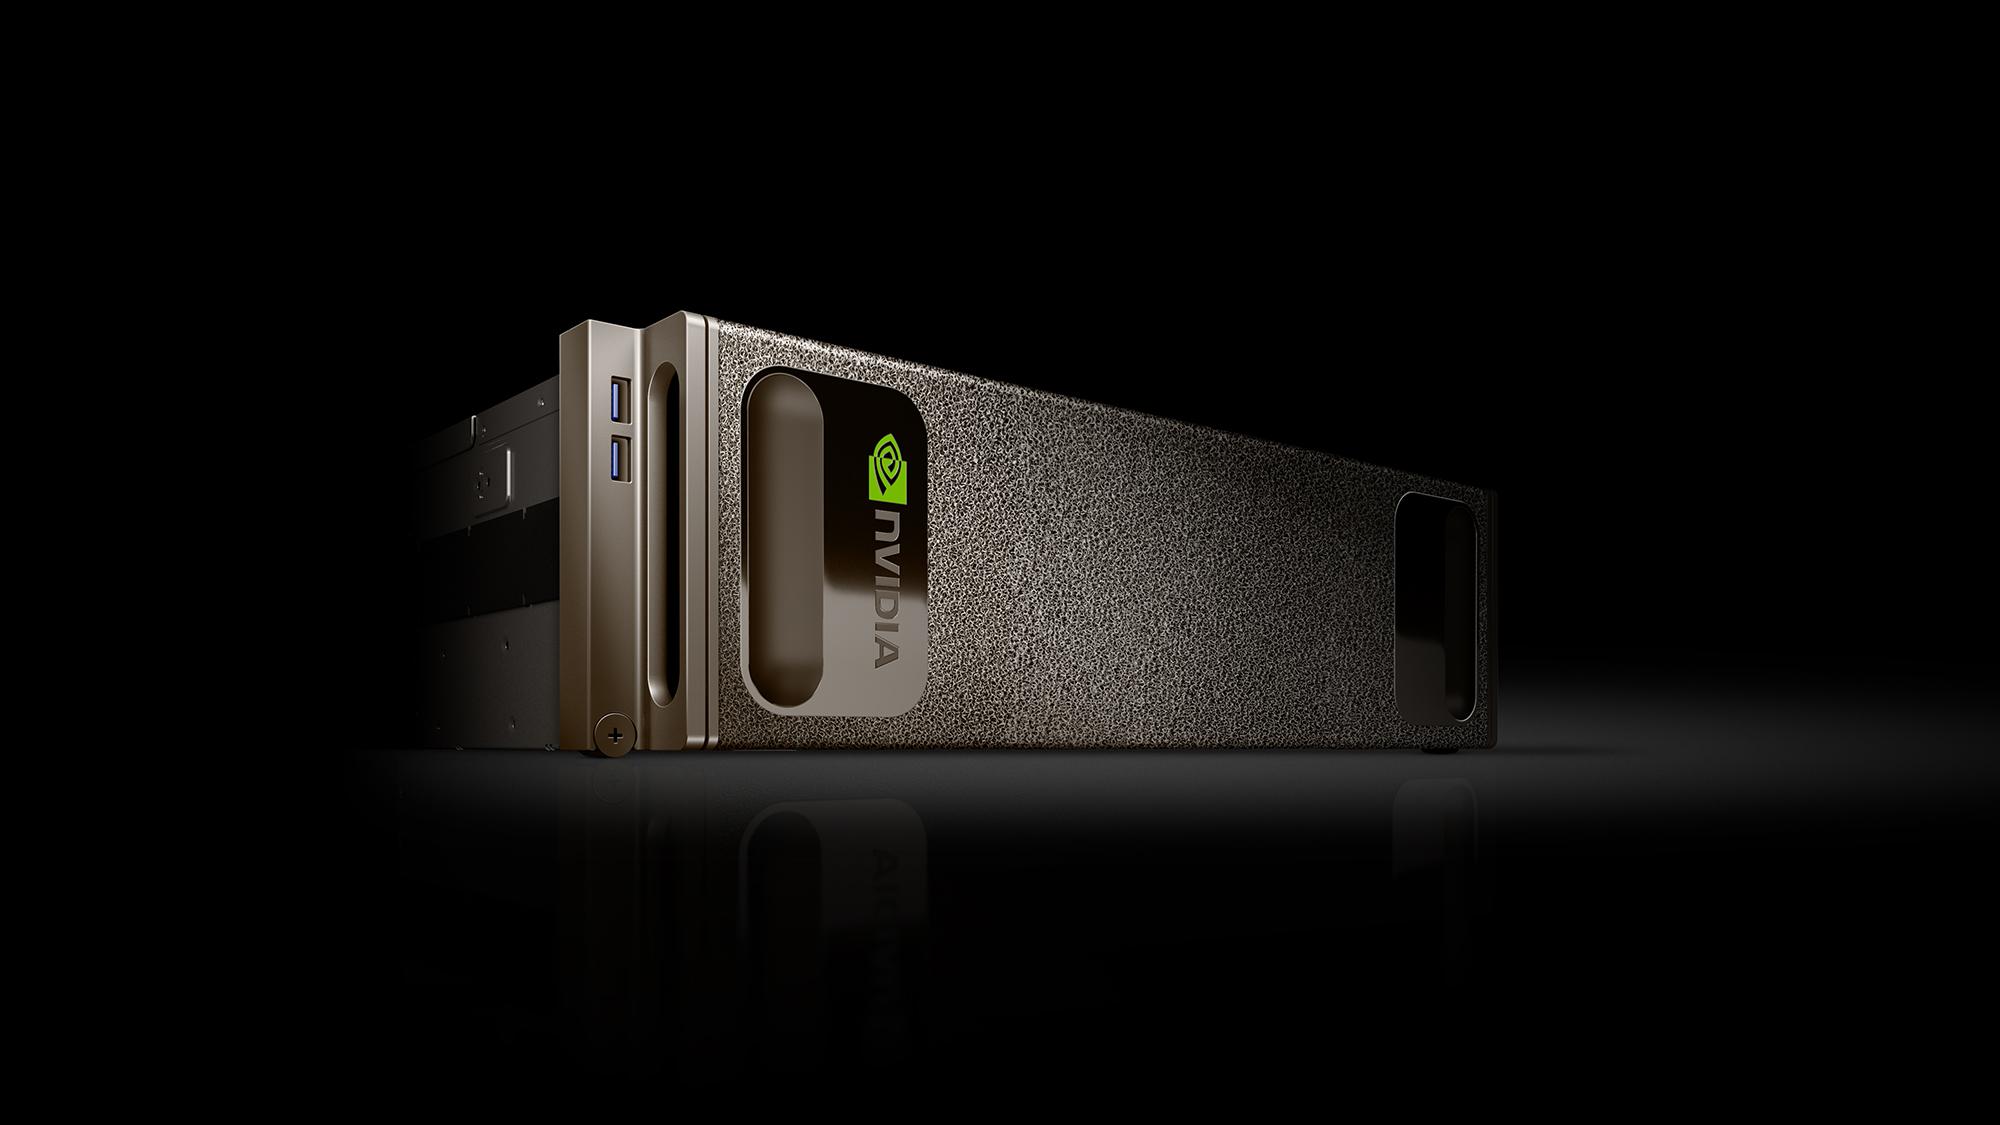 An NVIDIA DGX-1 AI chip, lying on its side.